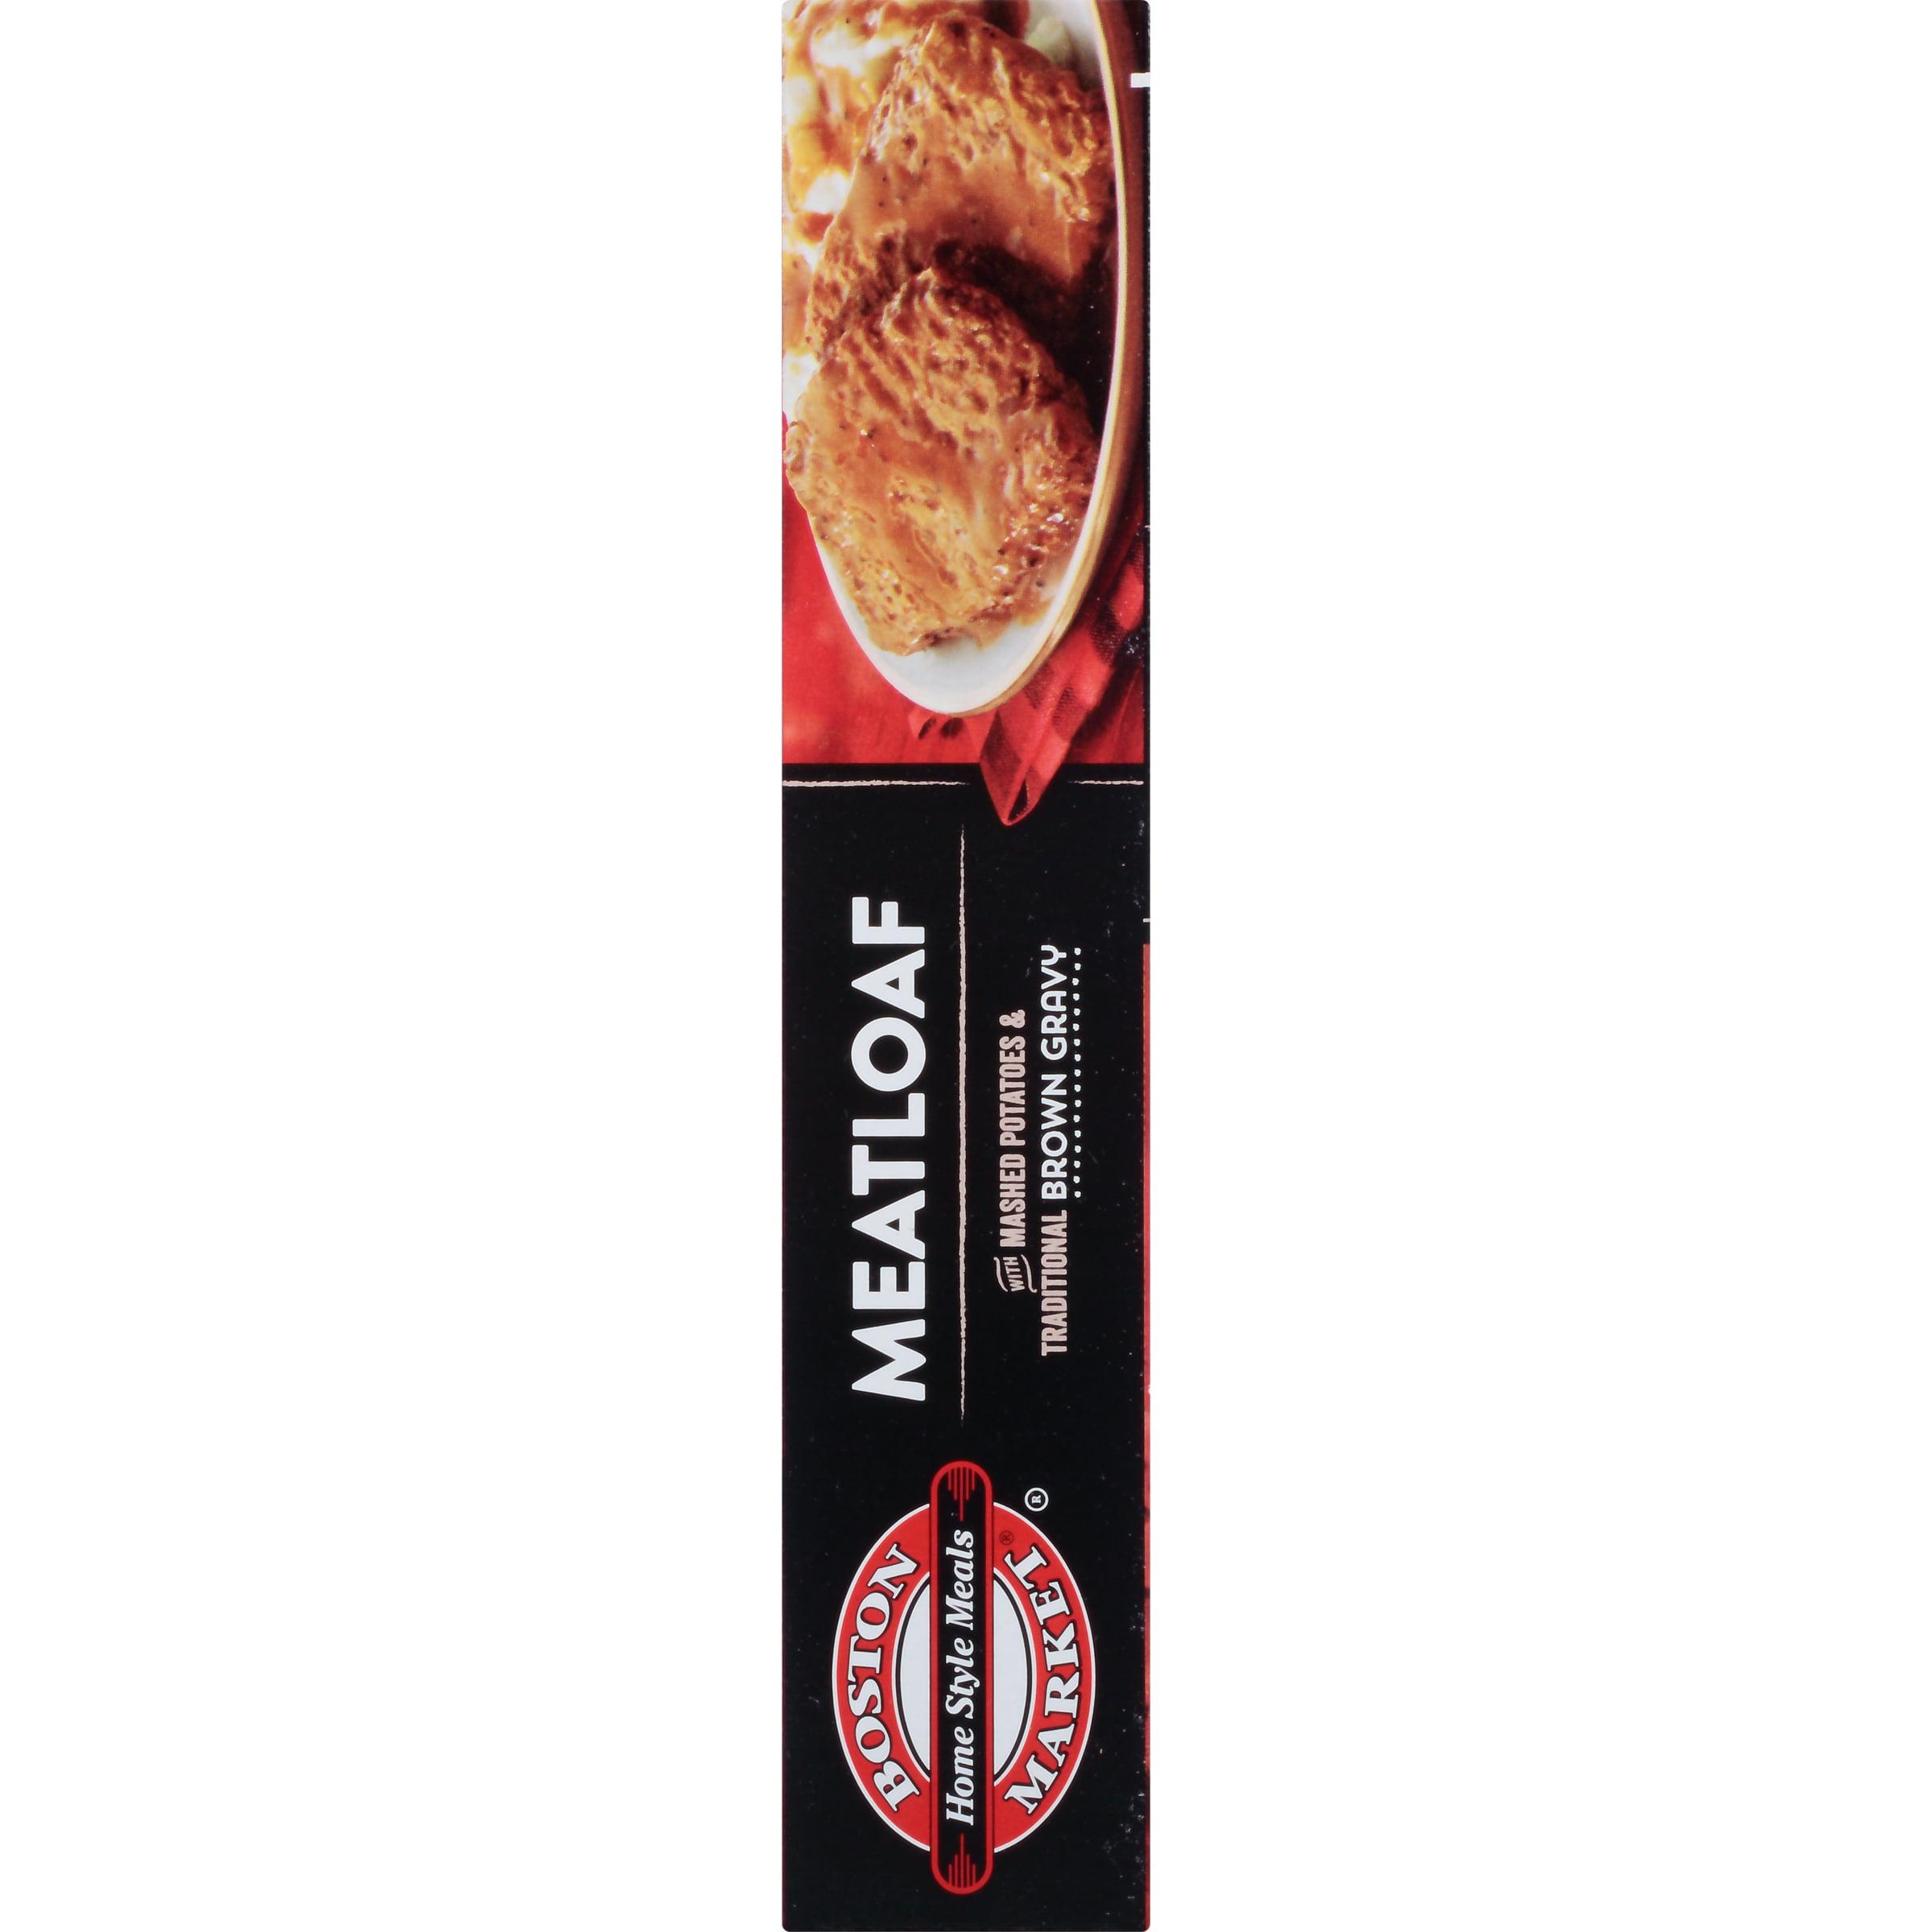 Boston Market® Home Style Meals Meatloaf 14 oz. Box - Walmart.com